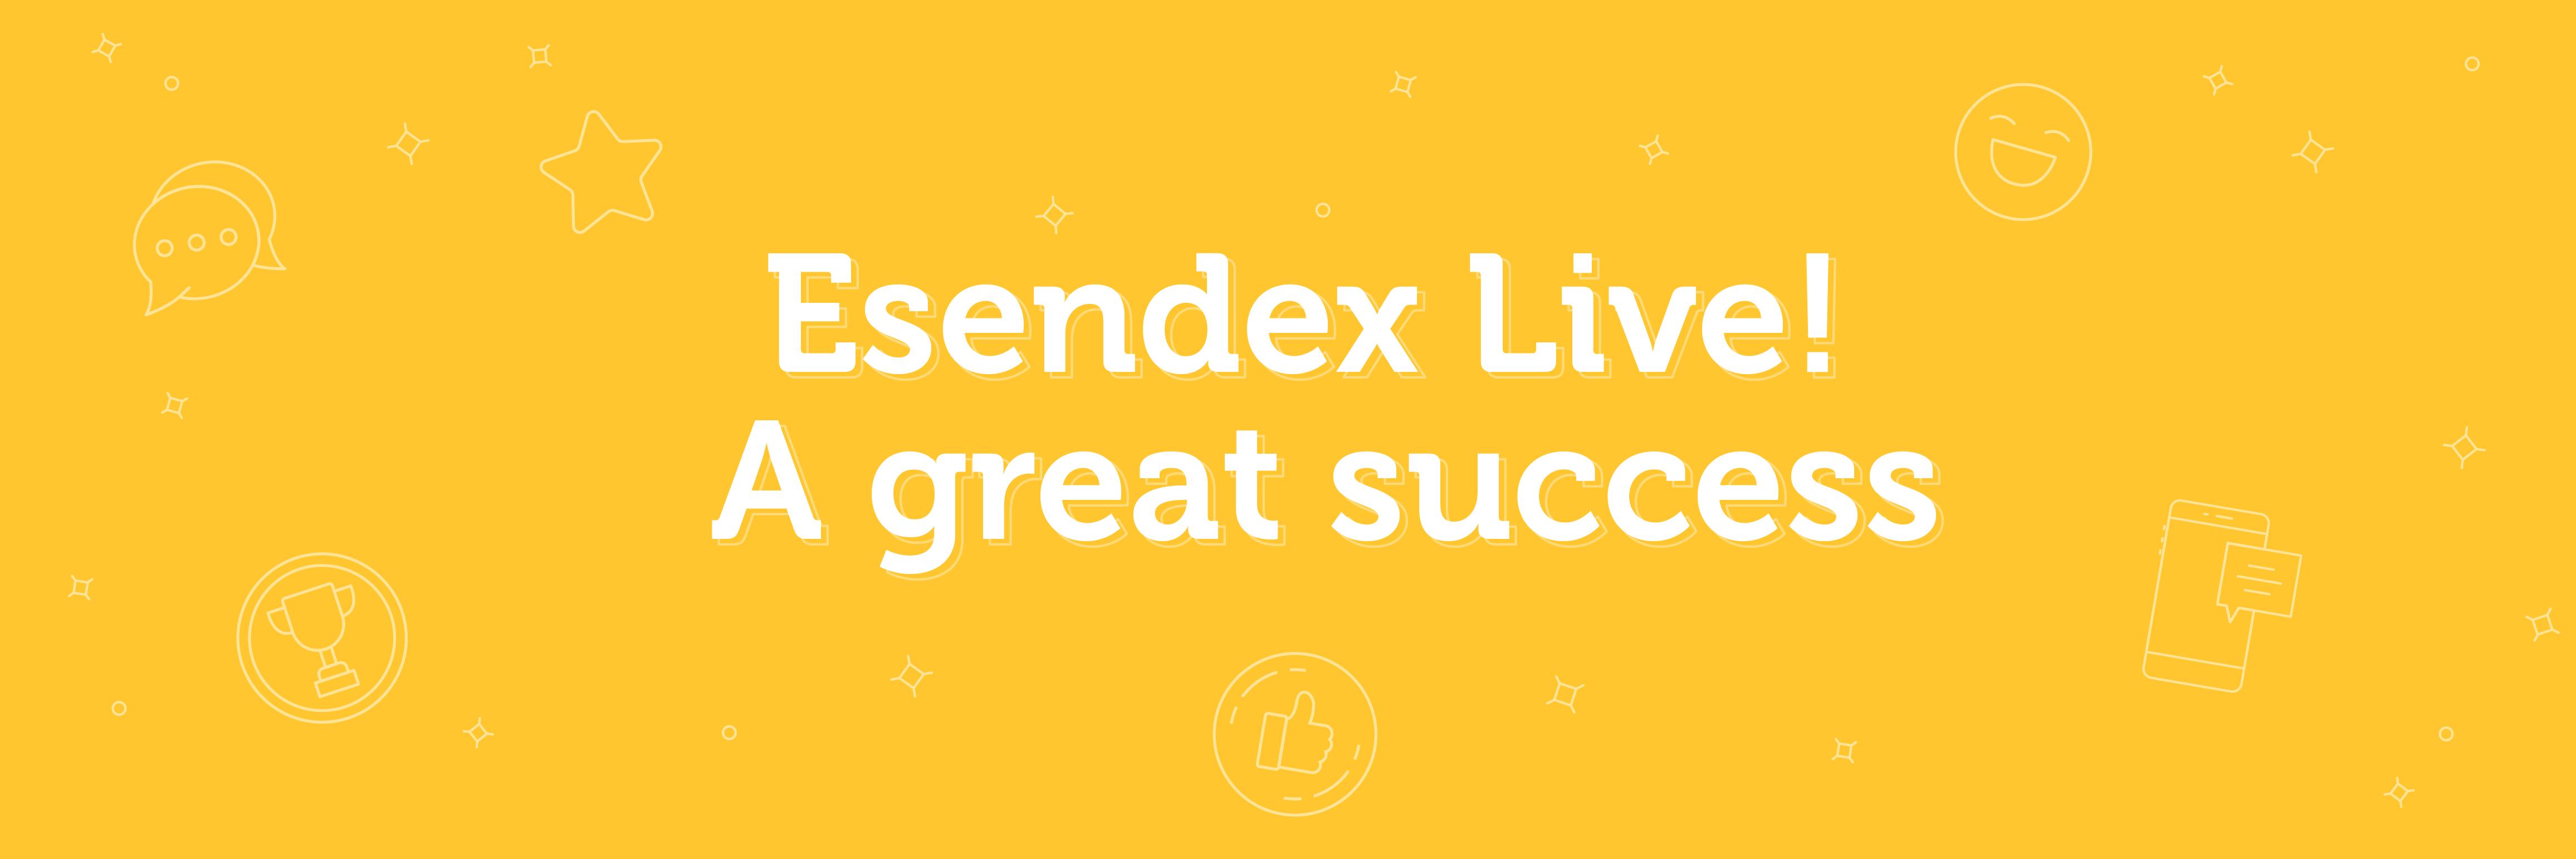 Esendex Live!